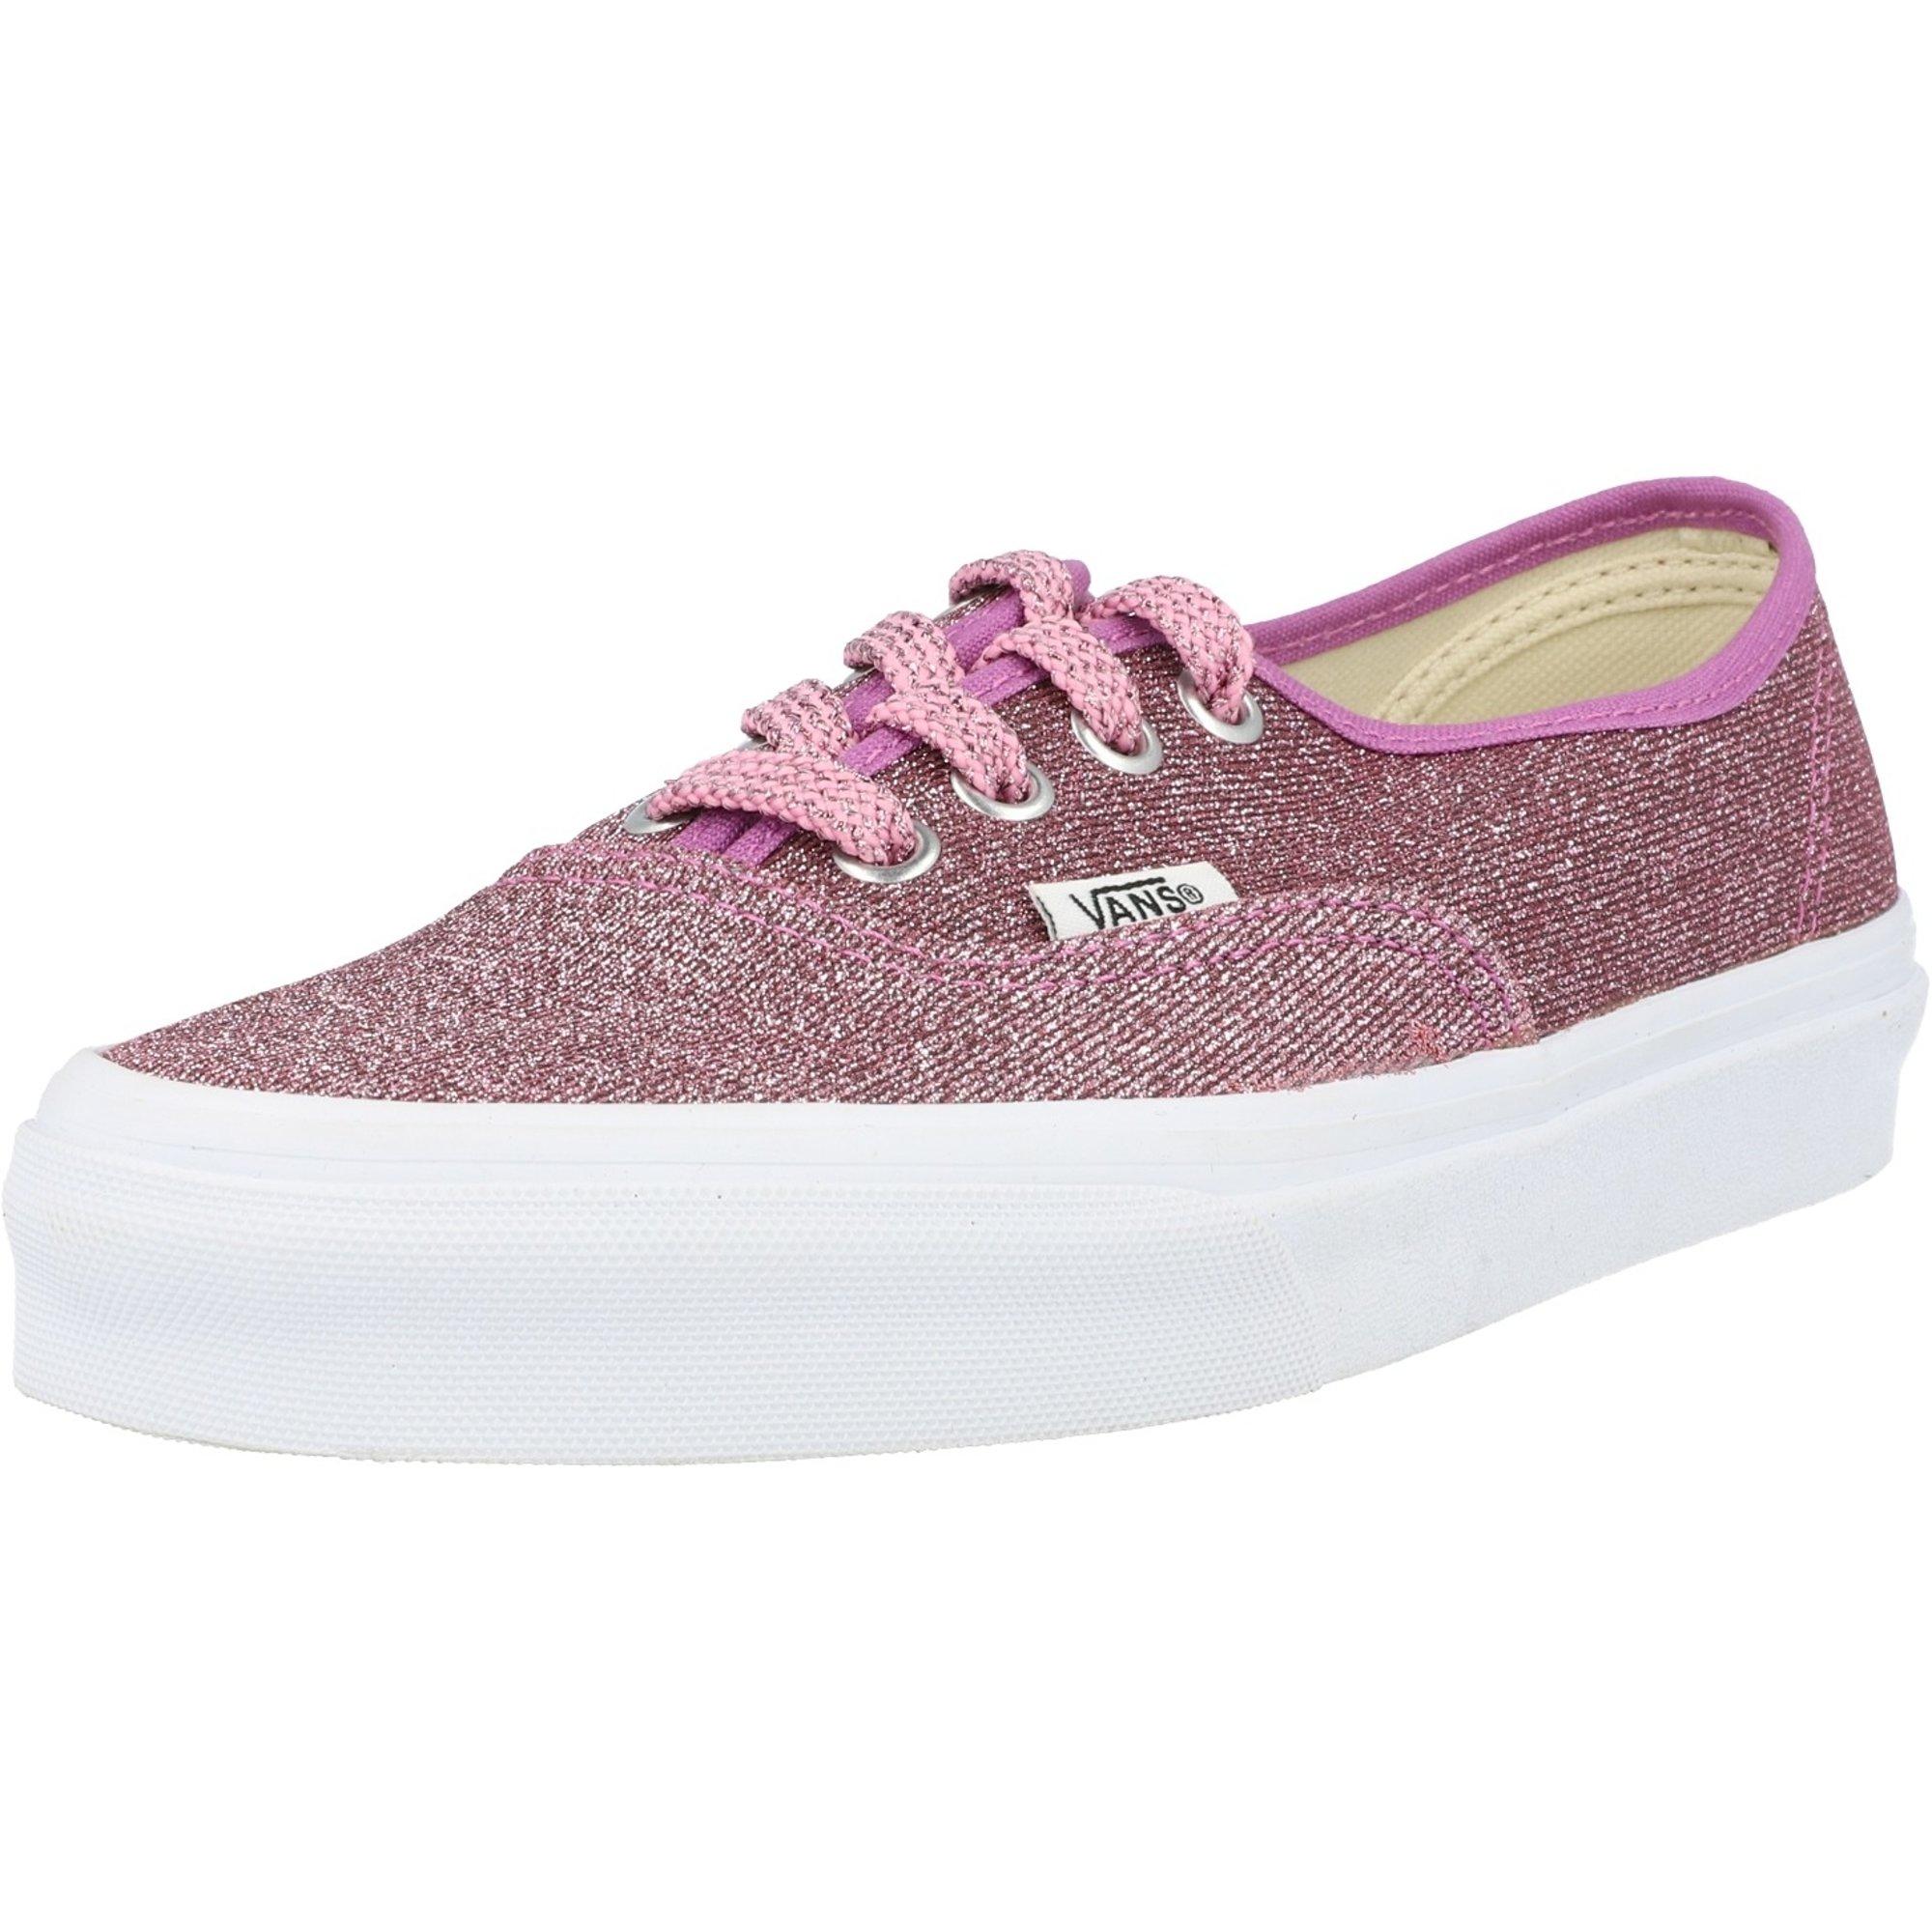 sparkly vans trainers